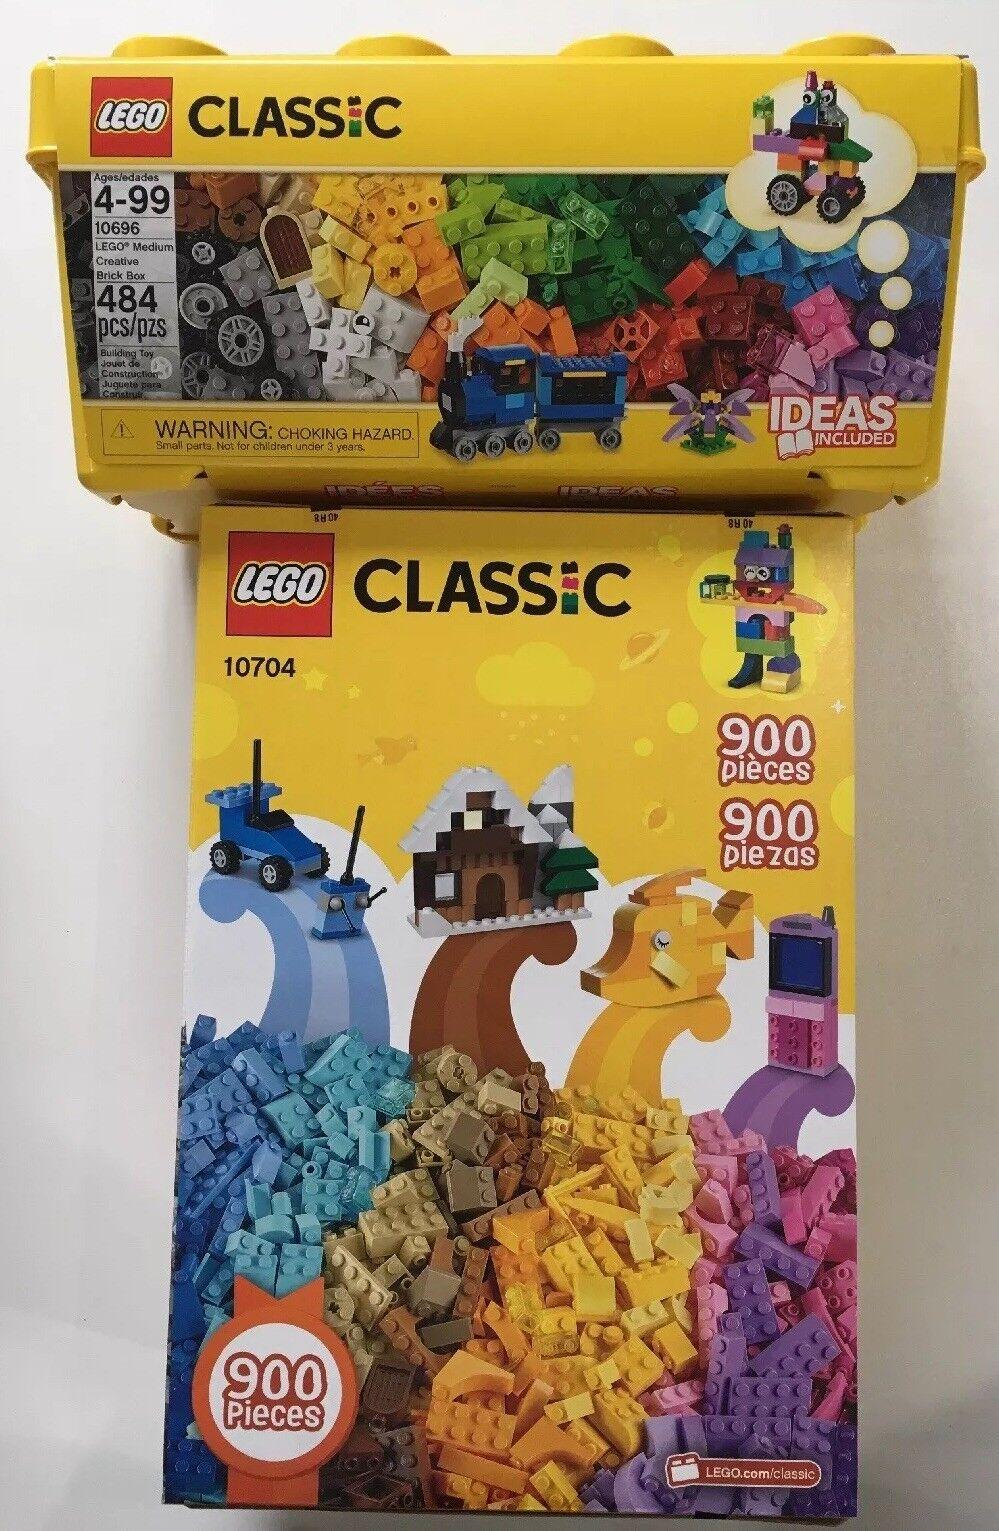 Classic Creative Lego Bundle- Classic Lego 10704 & 10696